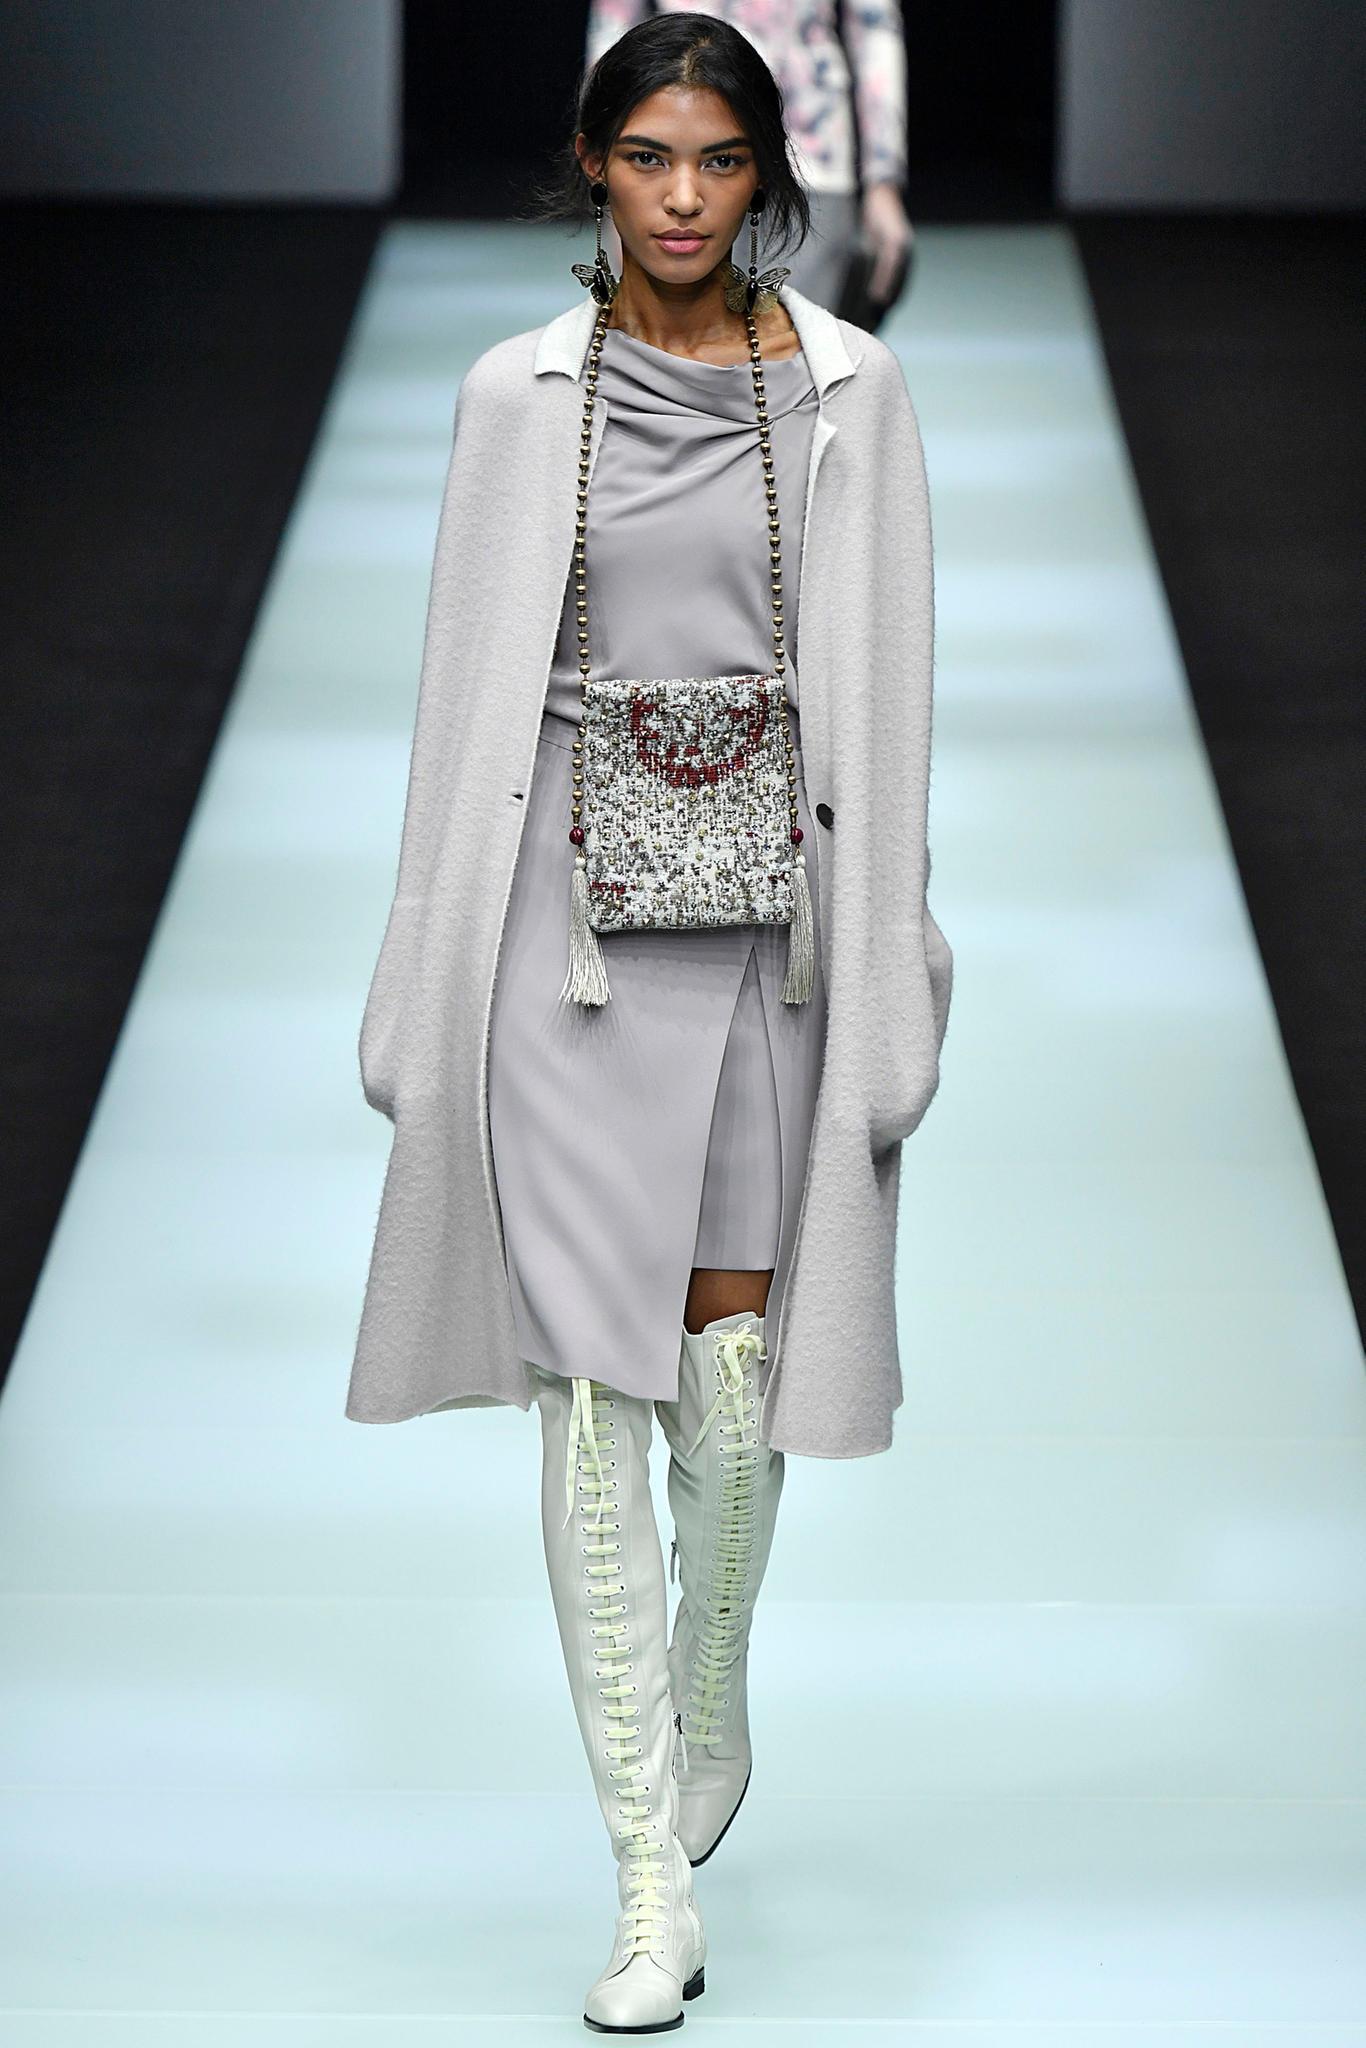 Mailand Fashion Week: Giorgio Armani